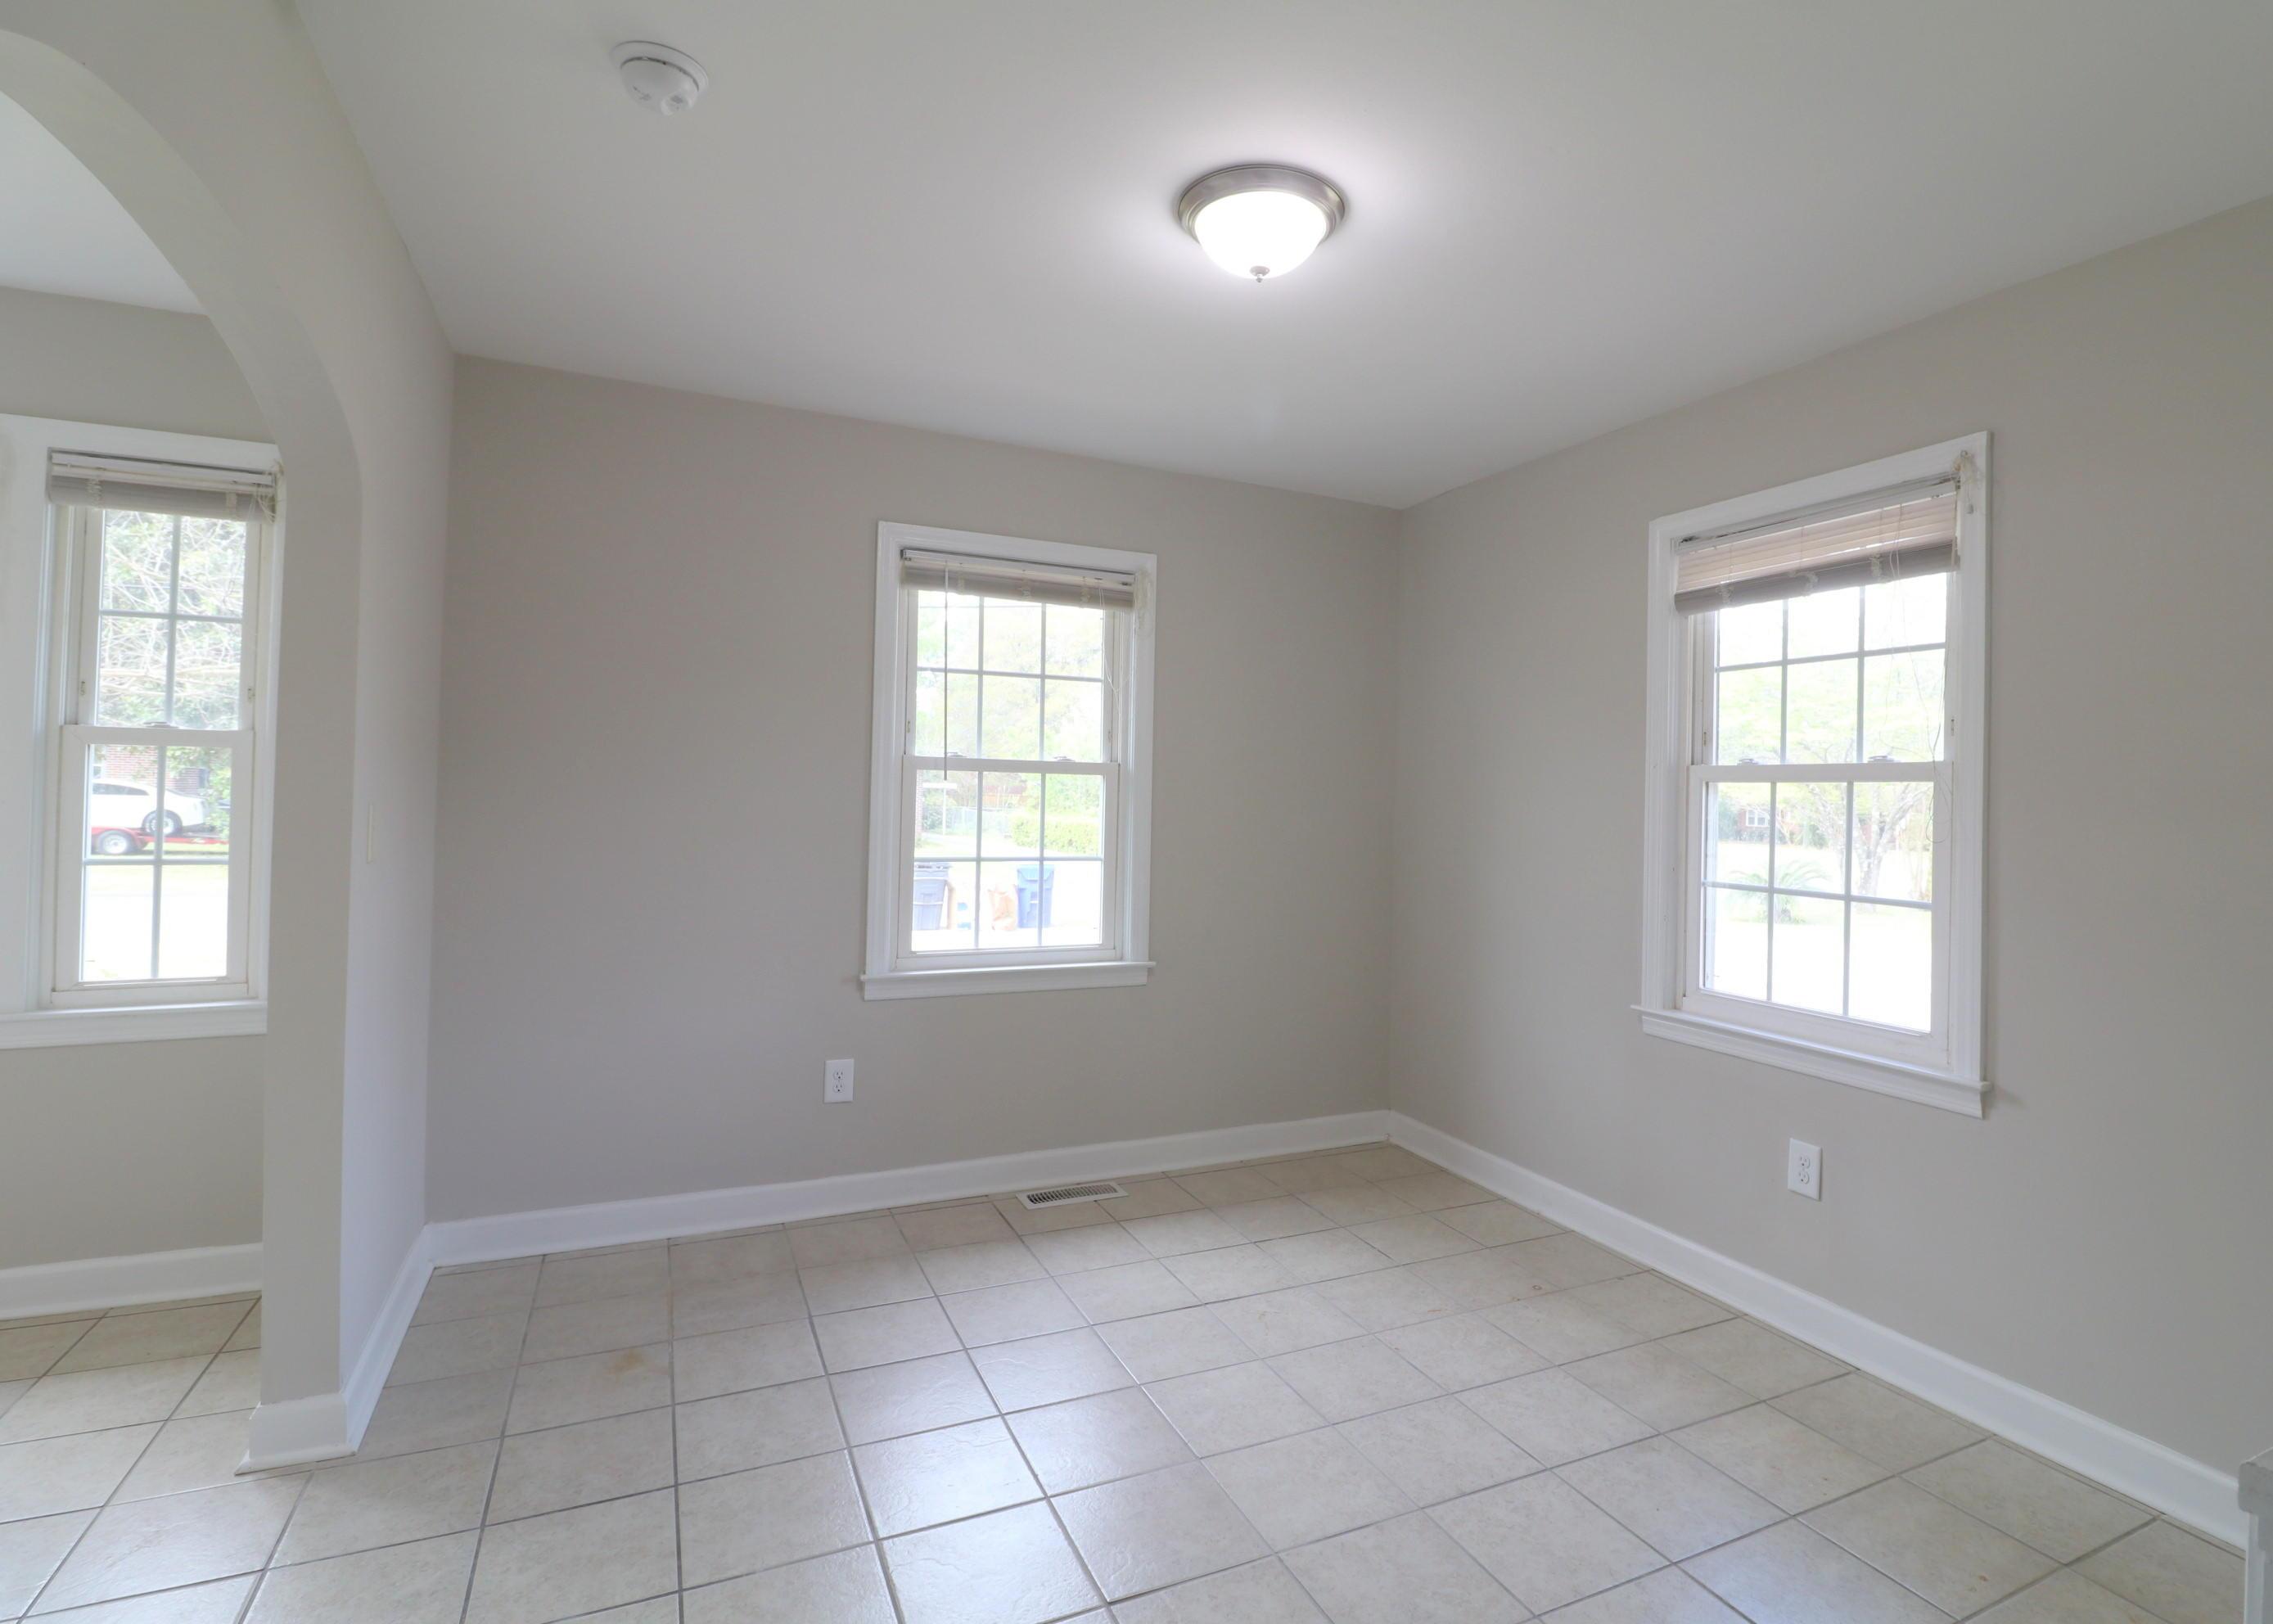 Park Circle Homes For Sale - 5274 Potomac, North Charleston, SC - 20